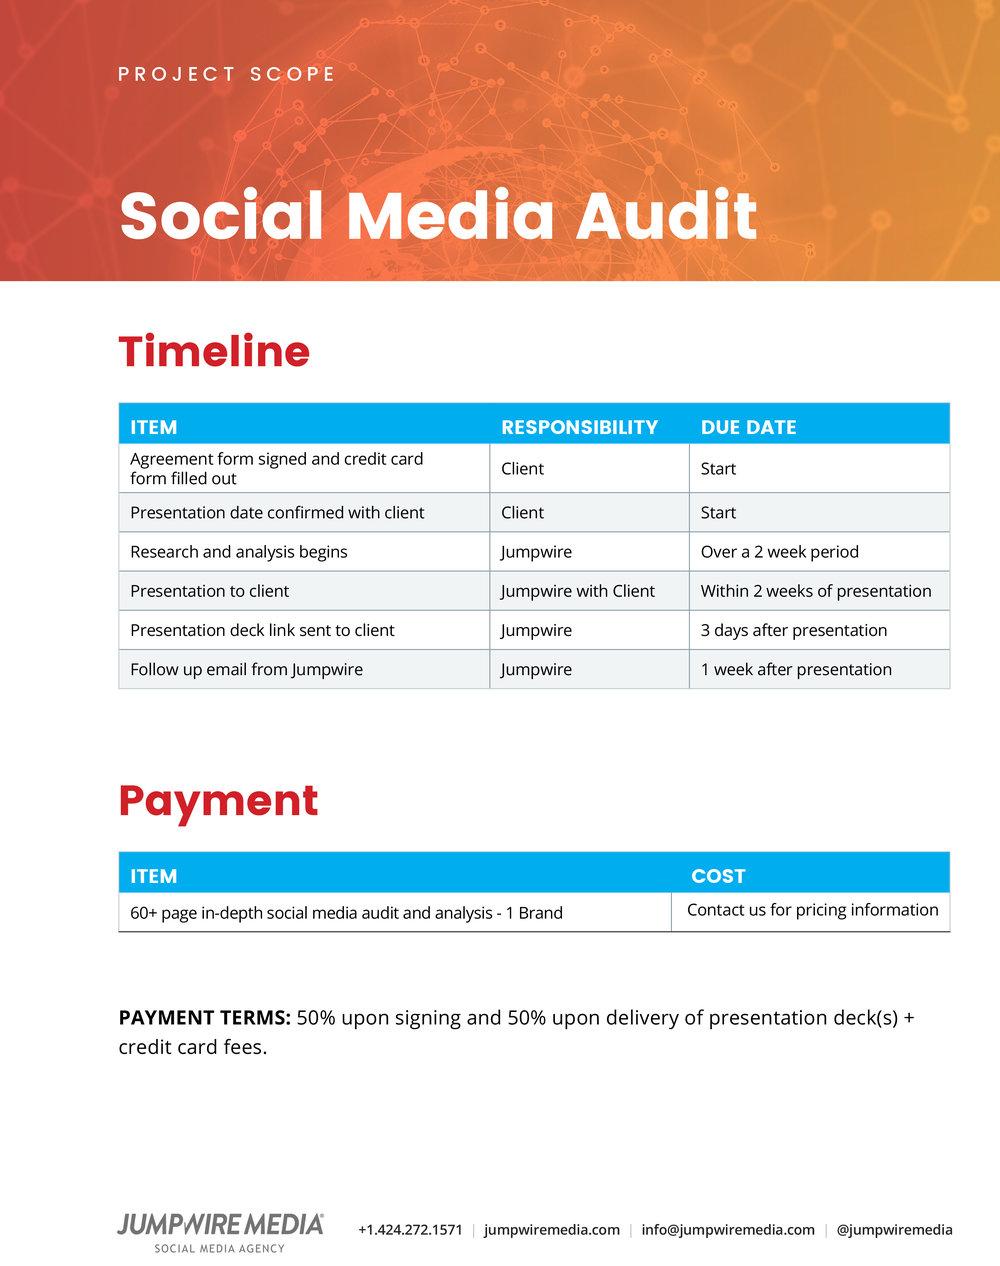 Jumpwire Social Audit Detail 2018-6.jpg